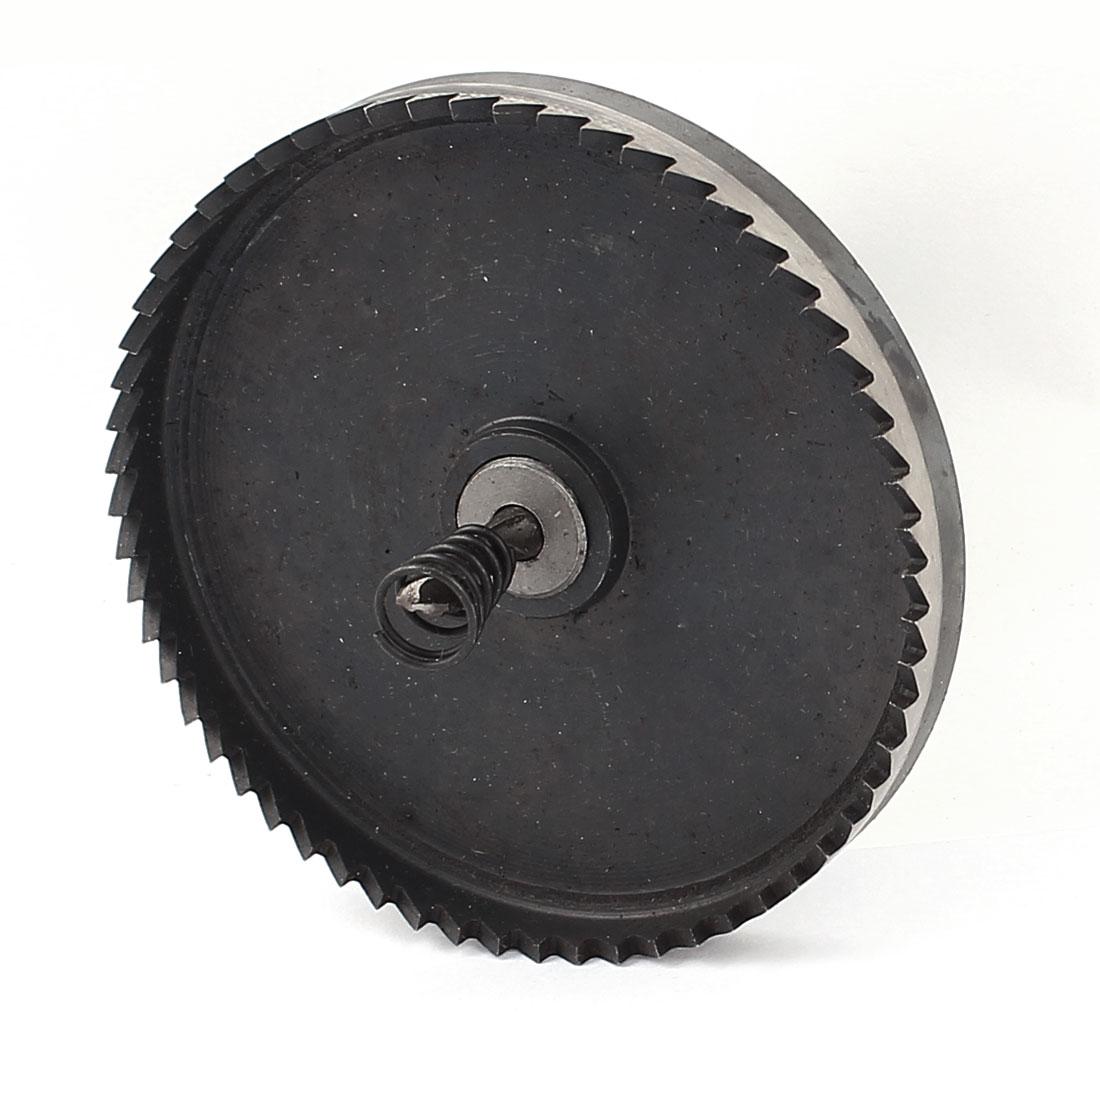 95mm Cutting Dia 12mm Triangle Shank Twist Drill Bit HSS Hole Saw Cutter for Metal Iron Steel